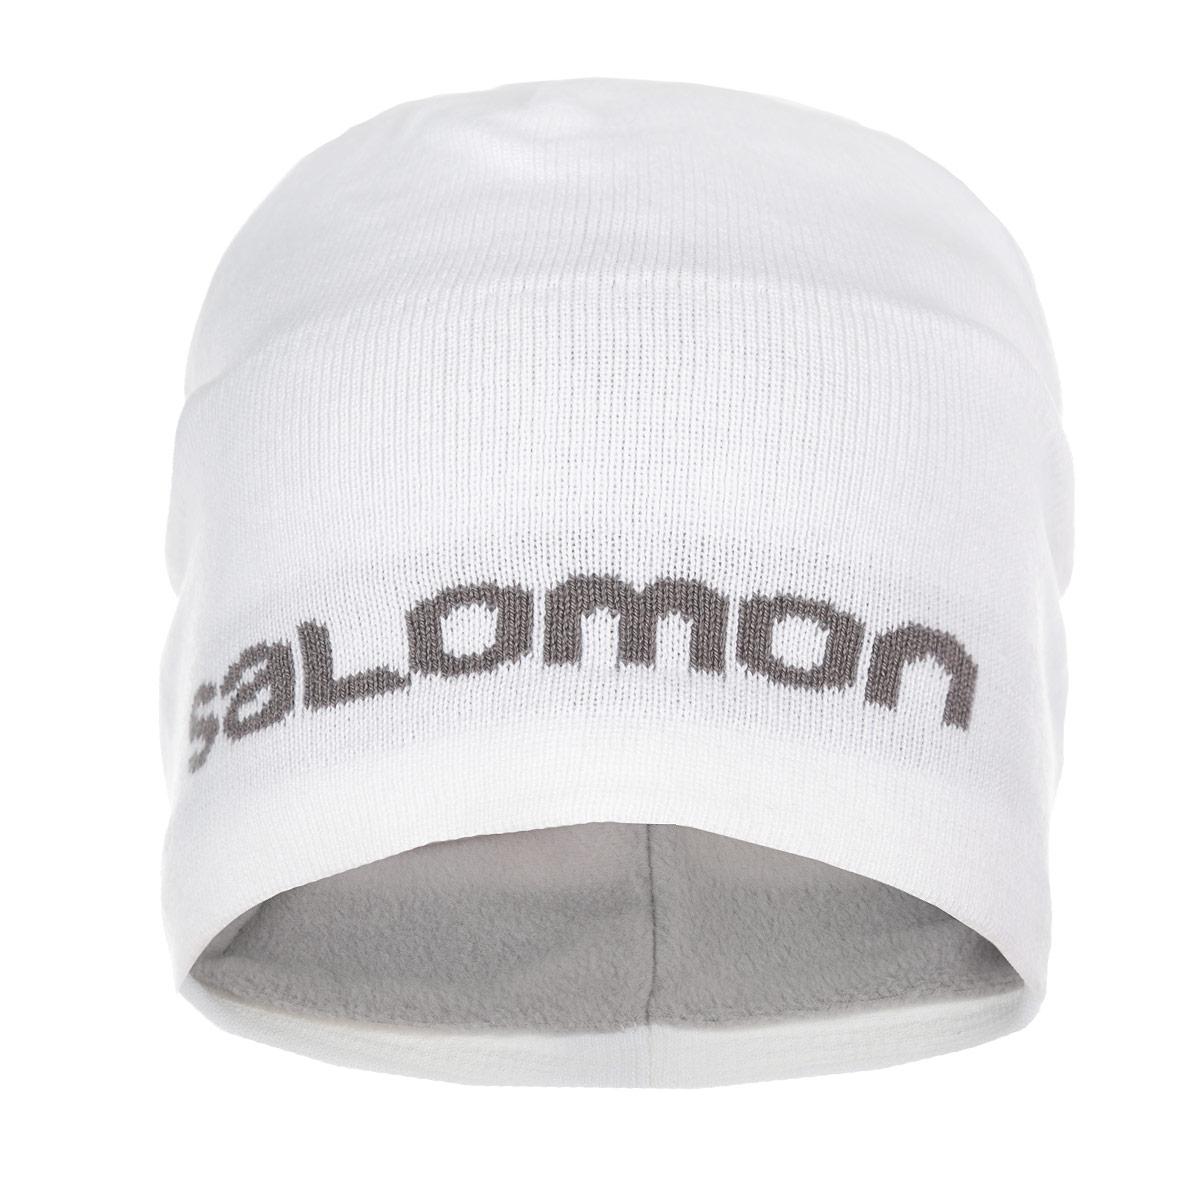 ����� ������� Beanie. L353 - SalomonL35300100����� Salomon Beanie ��������� �� �������� ������������ ��������� � ������ �������� ������ �� ���������� �������. ����� ������� ��� �� ��������� ����� � ������� ����� � �������. ������ �������� �������� ��� ��������� ������ � ������� �������. ����� ������� ��������� �������� Salomon.